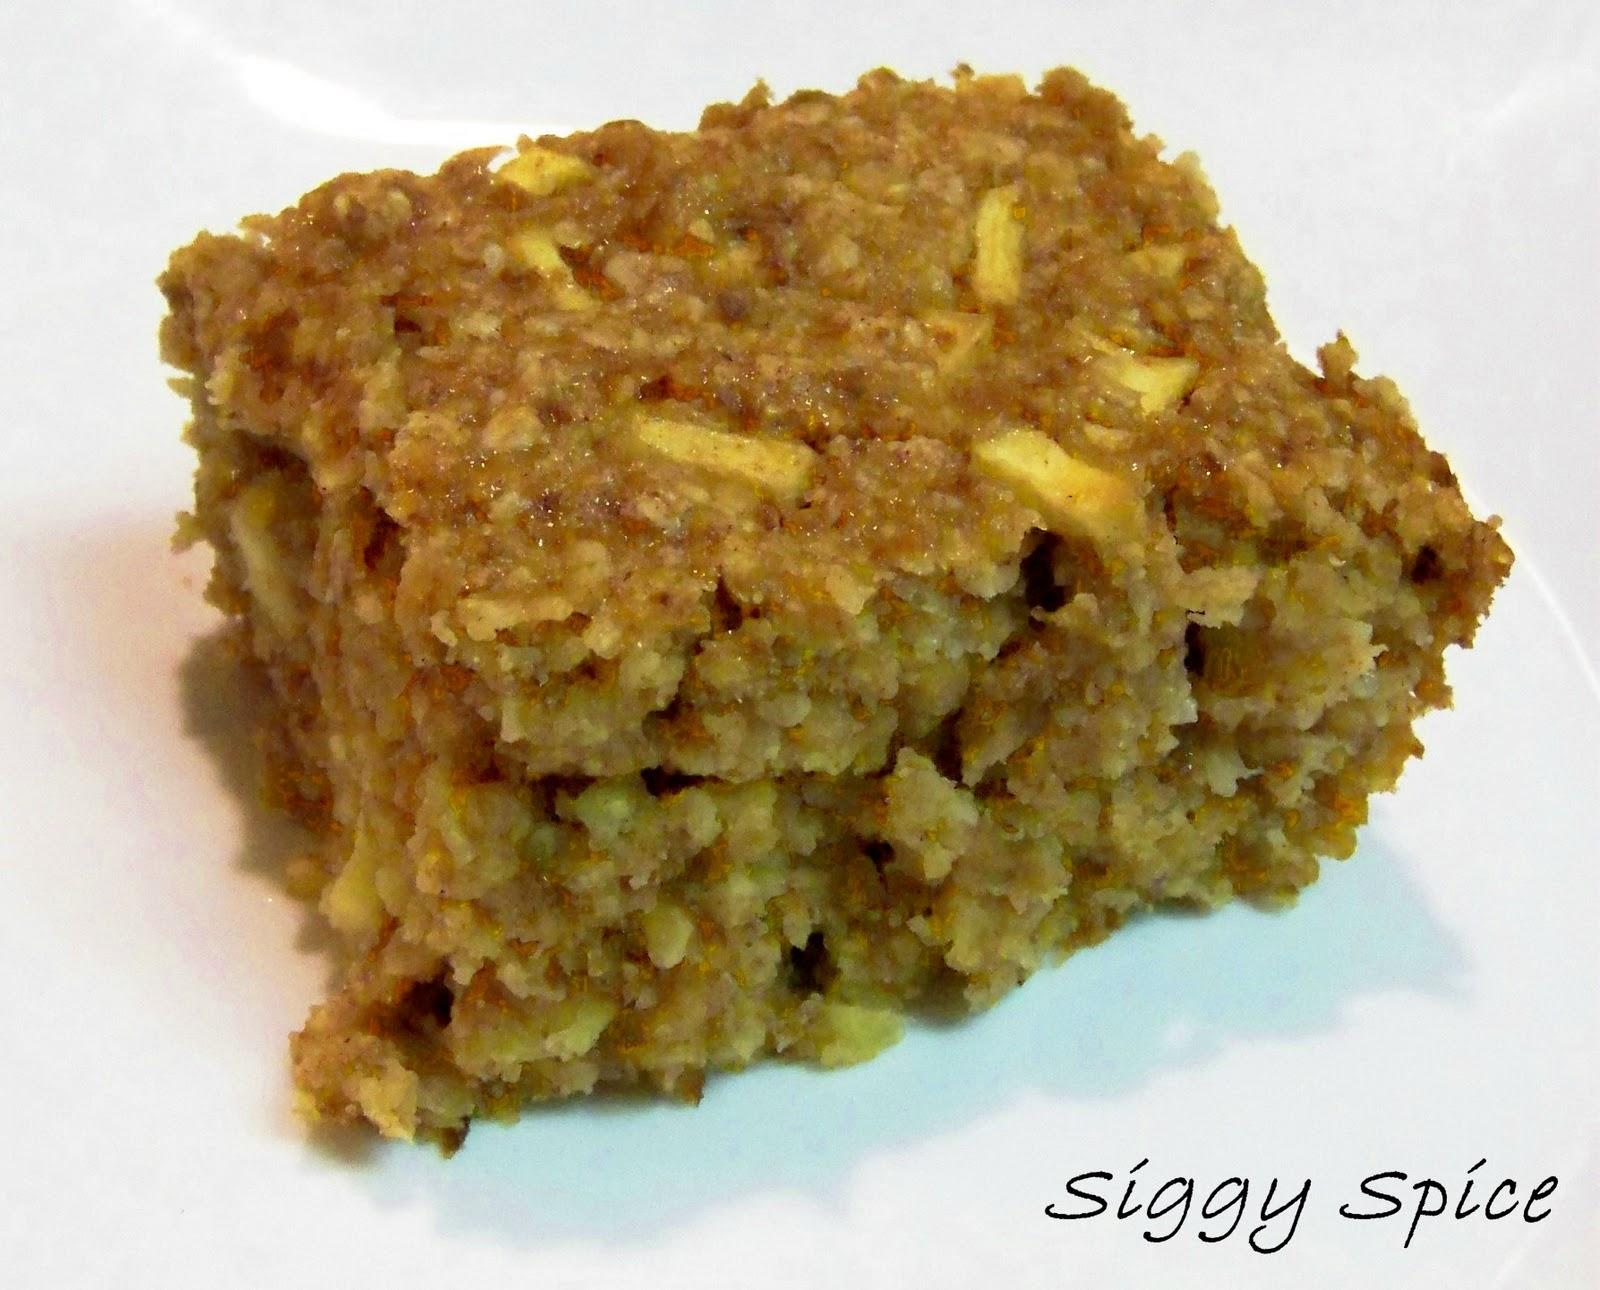 Siggy Spice: Cinnapple Baked Oatmeal